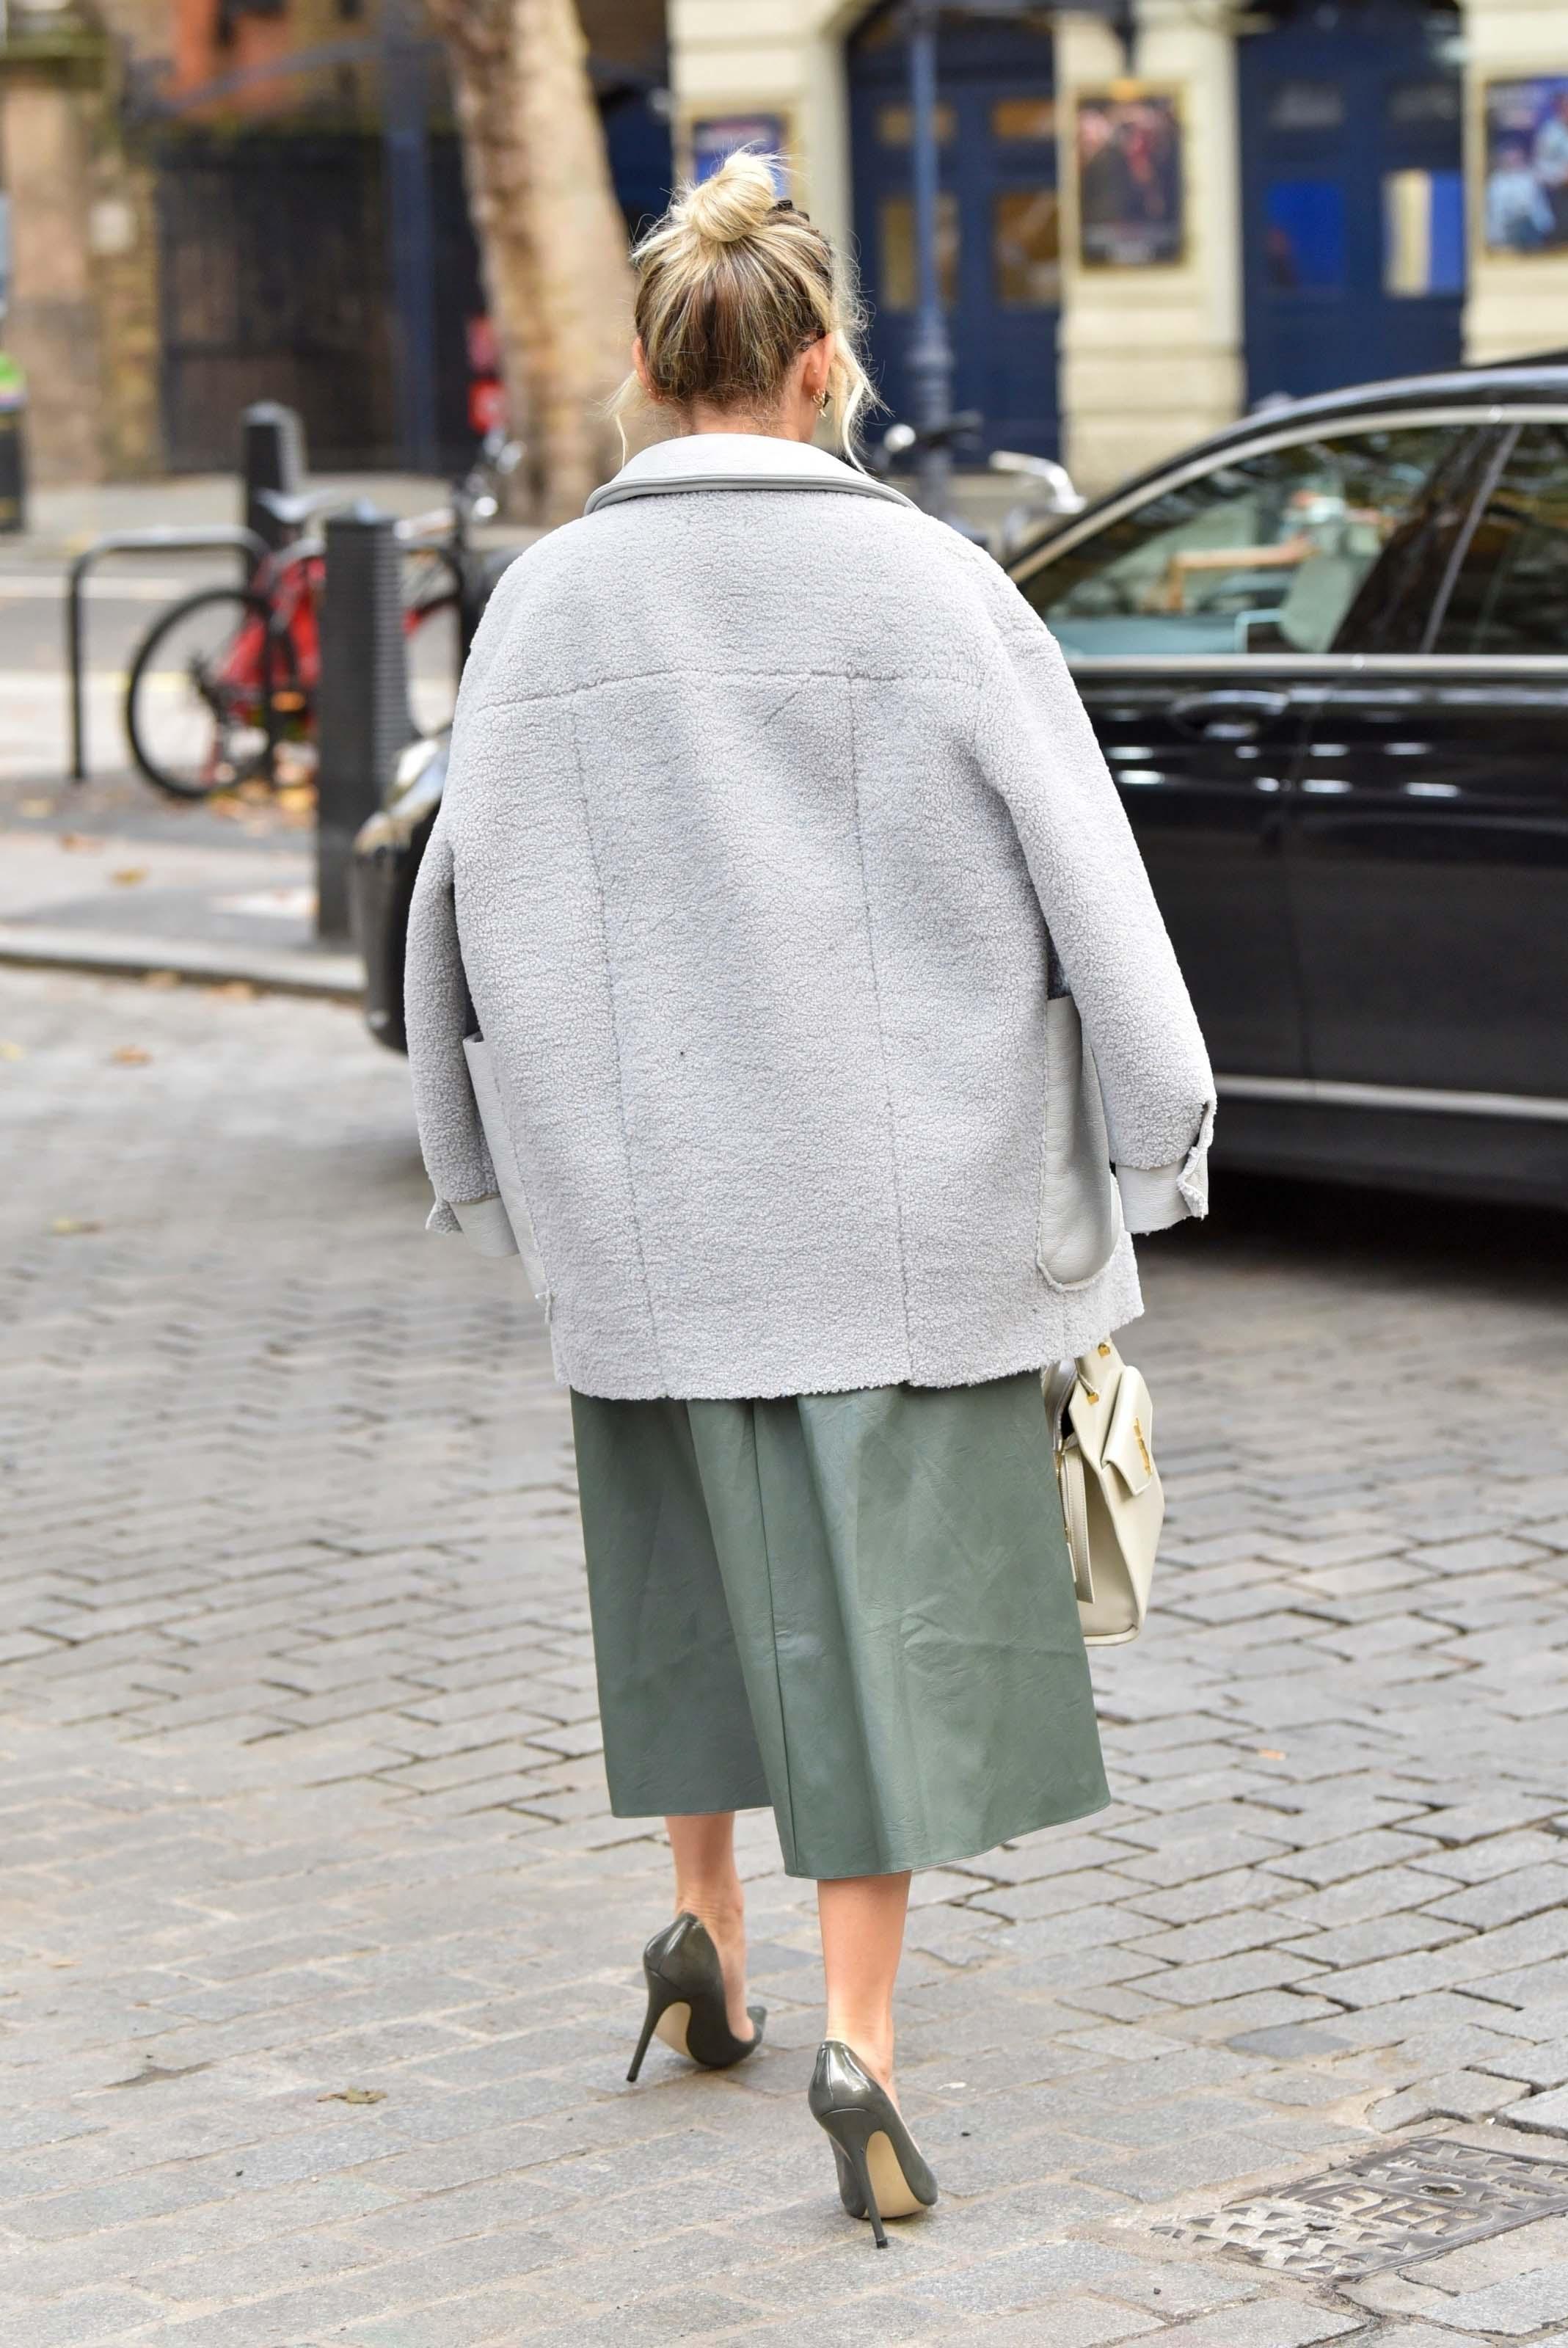 Ashley Roberts leaving the Global studios in London